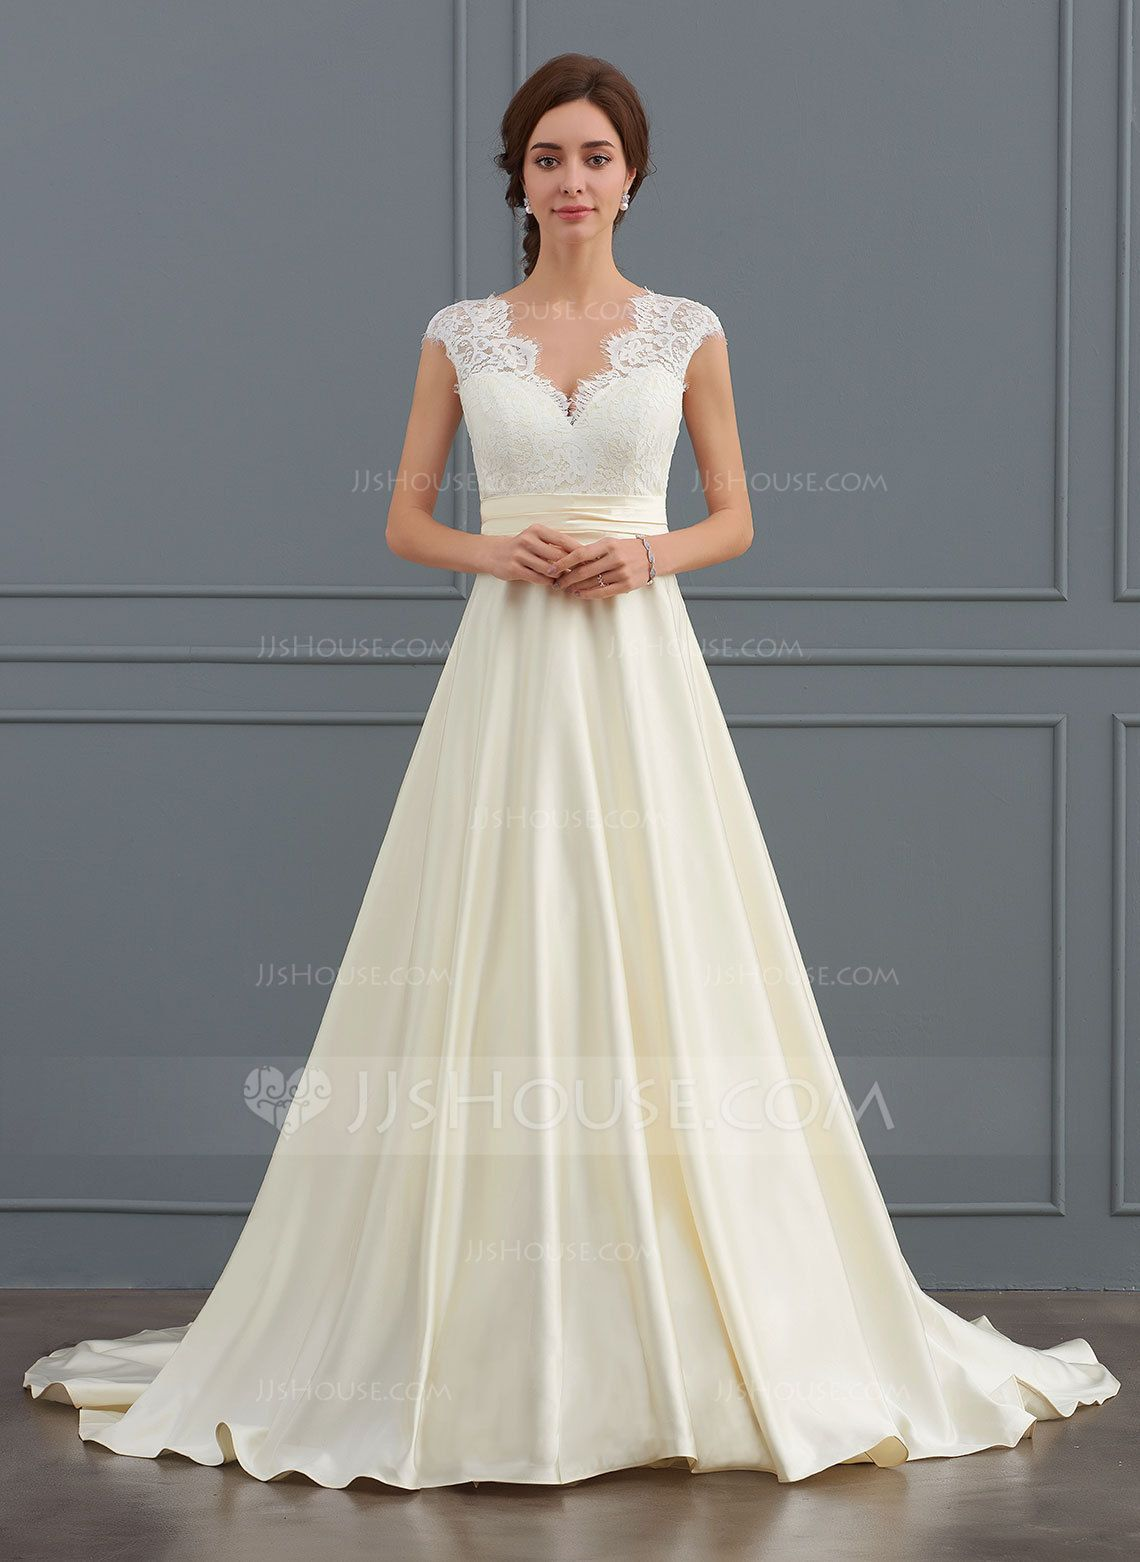 Ball Gown V Neck Court Train Satin Wedding Dress With Ruffle 002127251 Wedding Dresses Jj Ruffle Wedding Dress Satin Wedding Dress Wedding Dress Patterns [ 1562 x 1140 Pixel ]